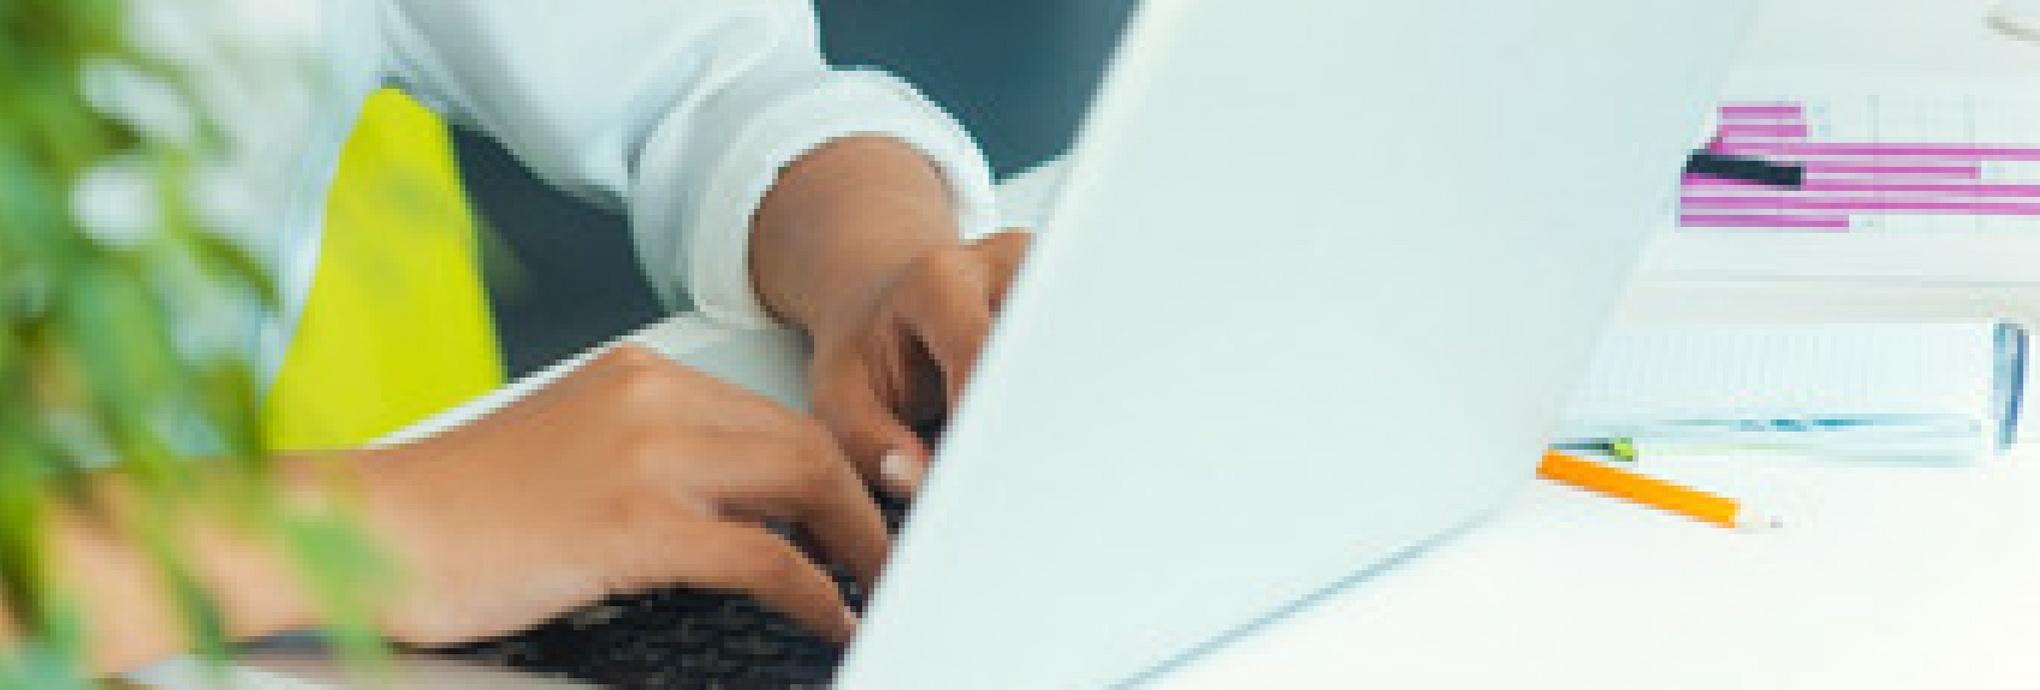 Womans_Marketing_Woman_Working_Computer.jpg